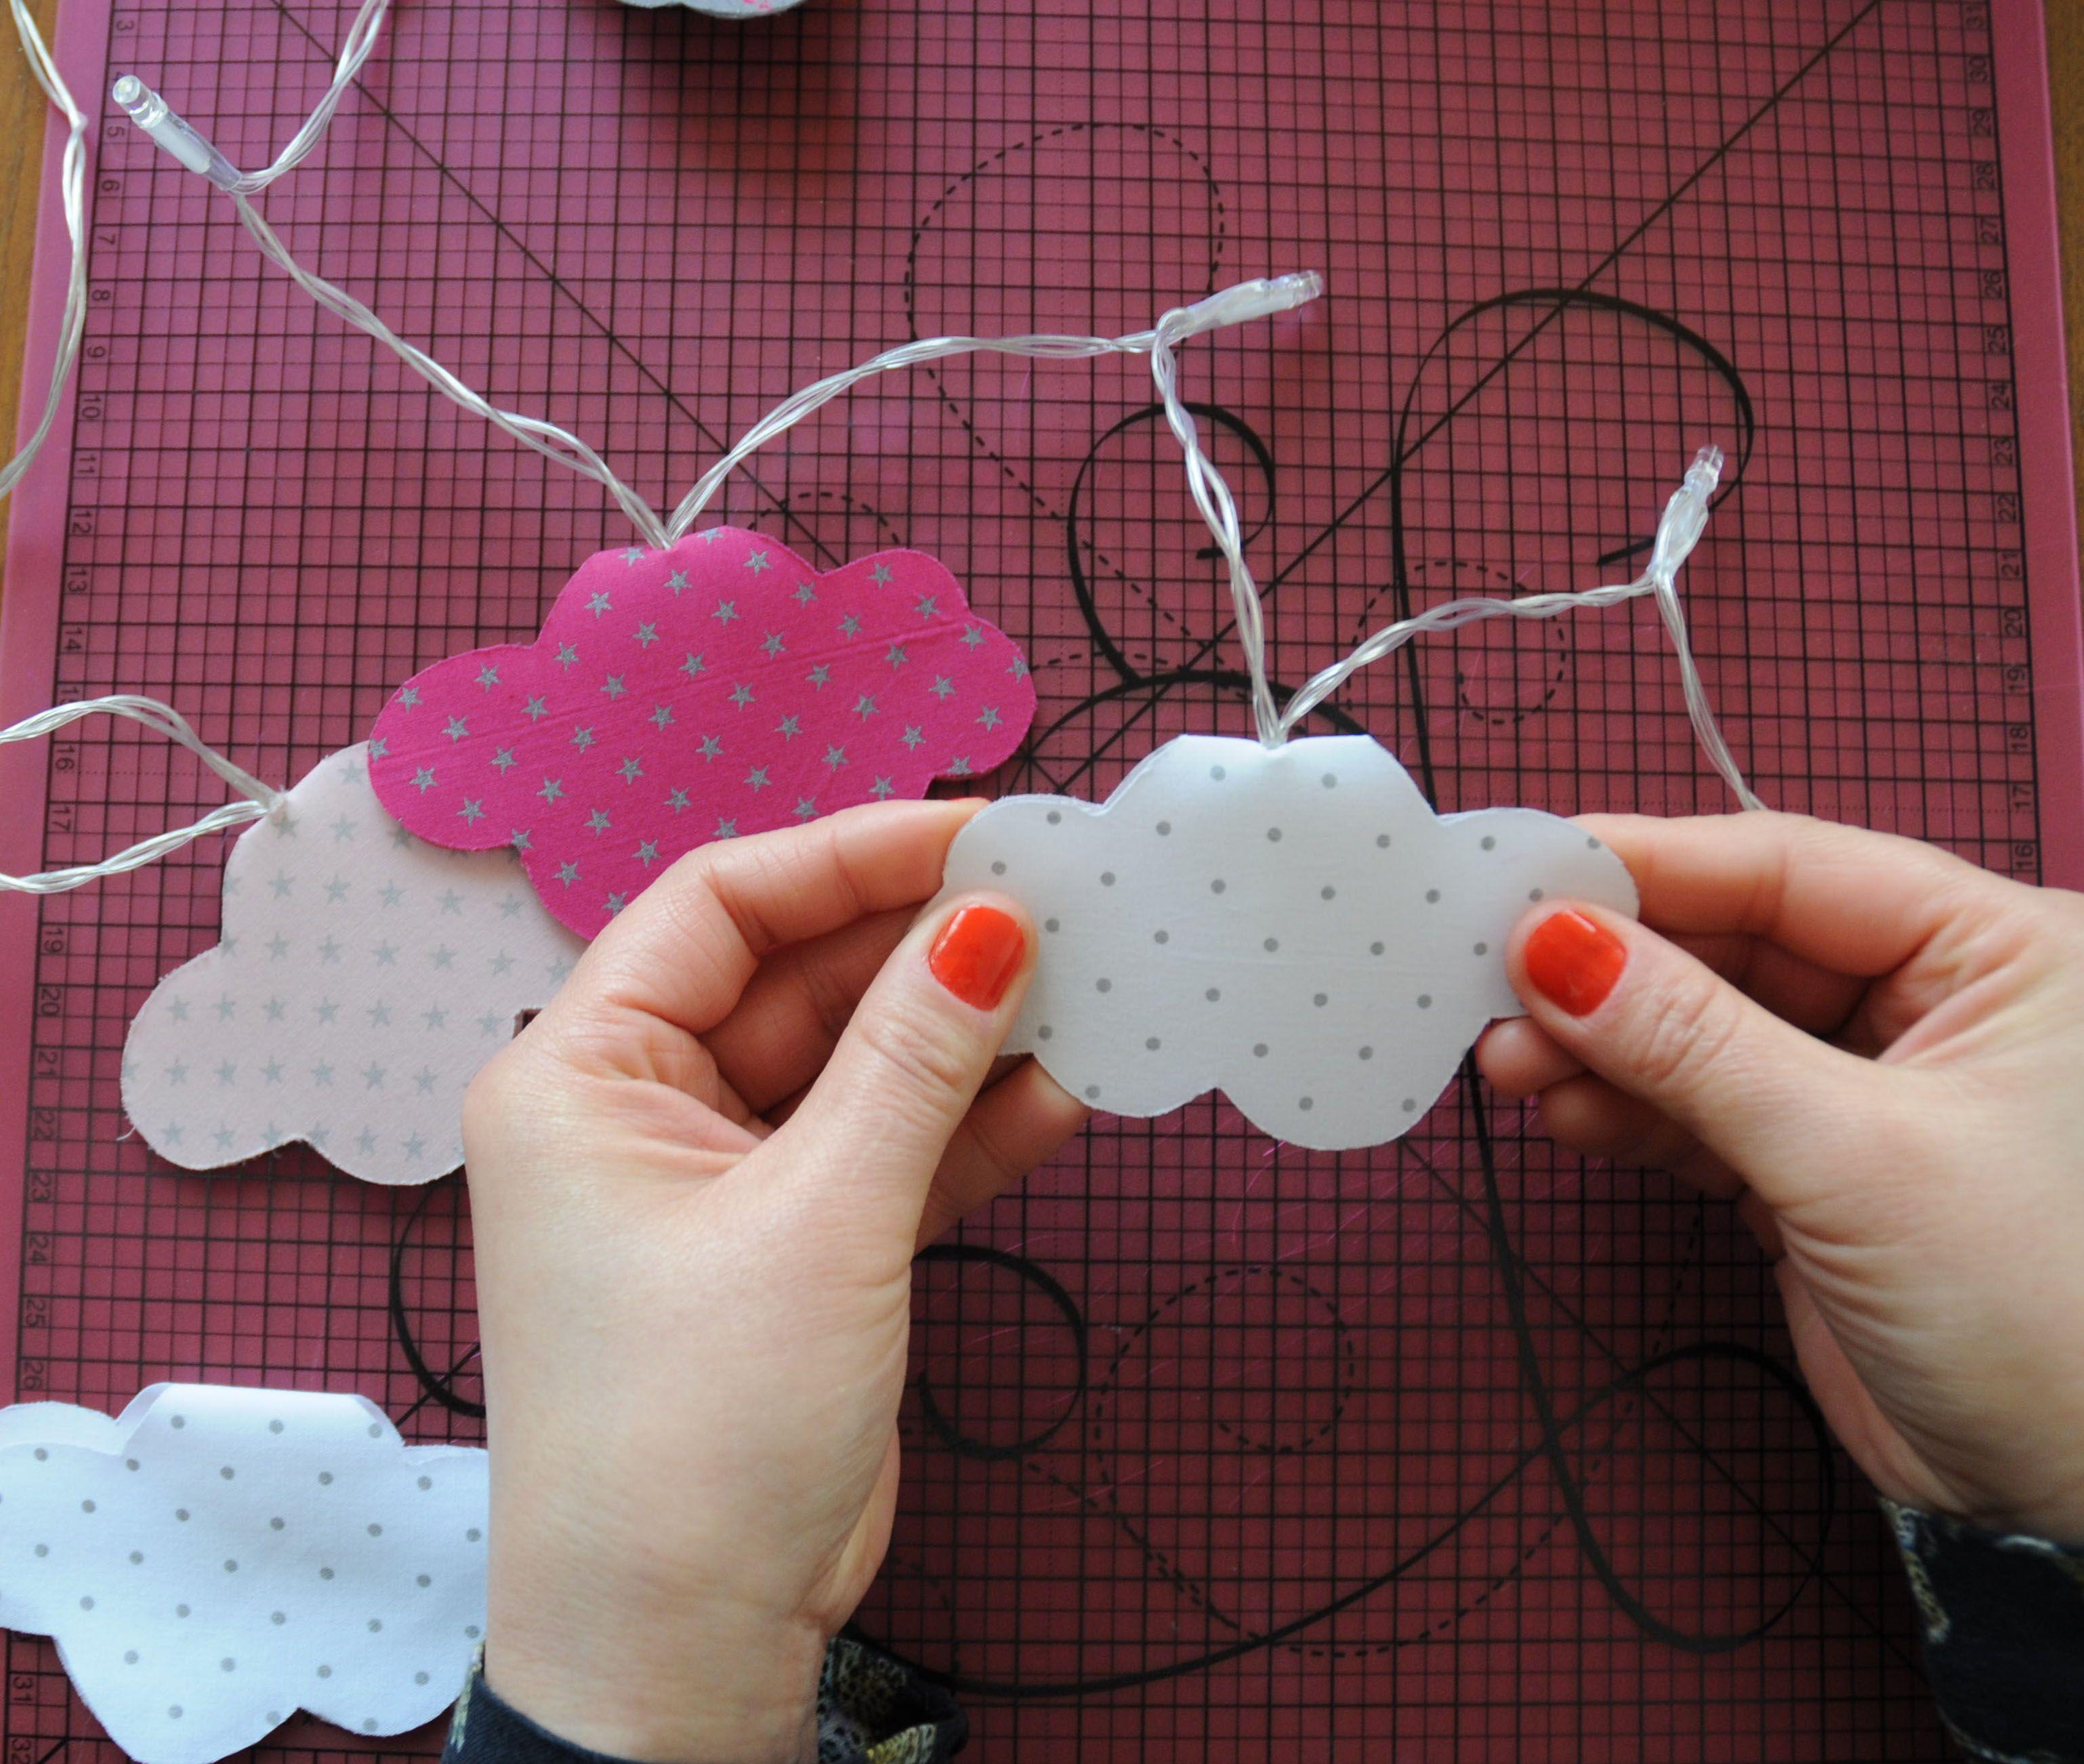 jolie guirlande lumineuse guirlandes pinterest diy origami and bricolage. Black Bedroom Furniture Sets. Home Design Ideas